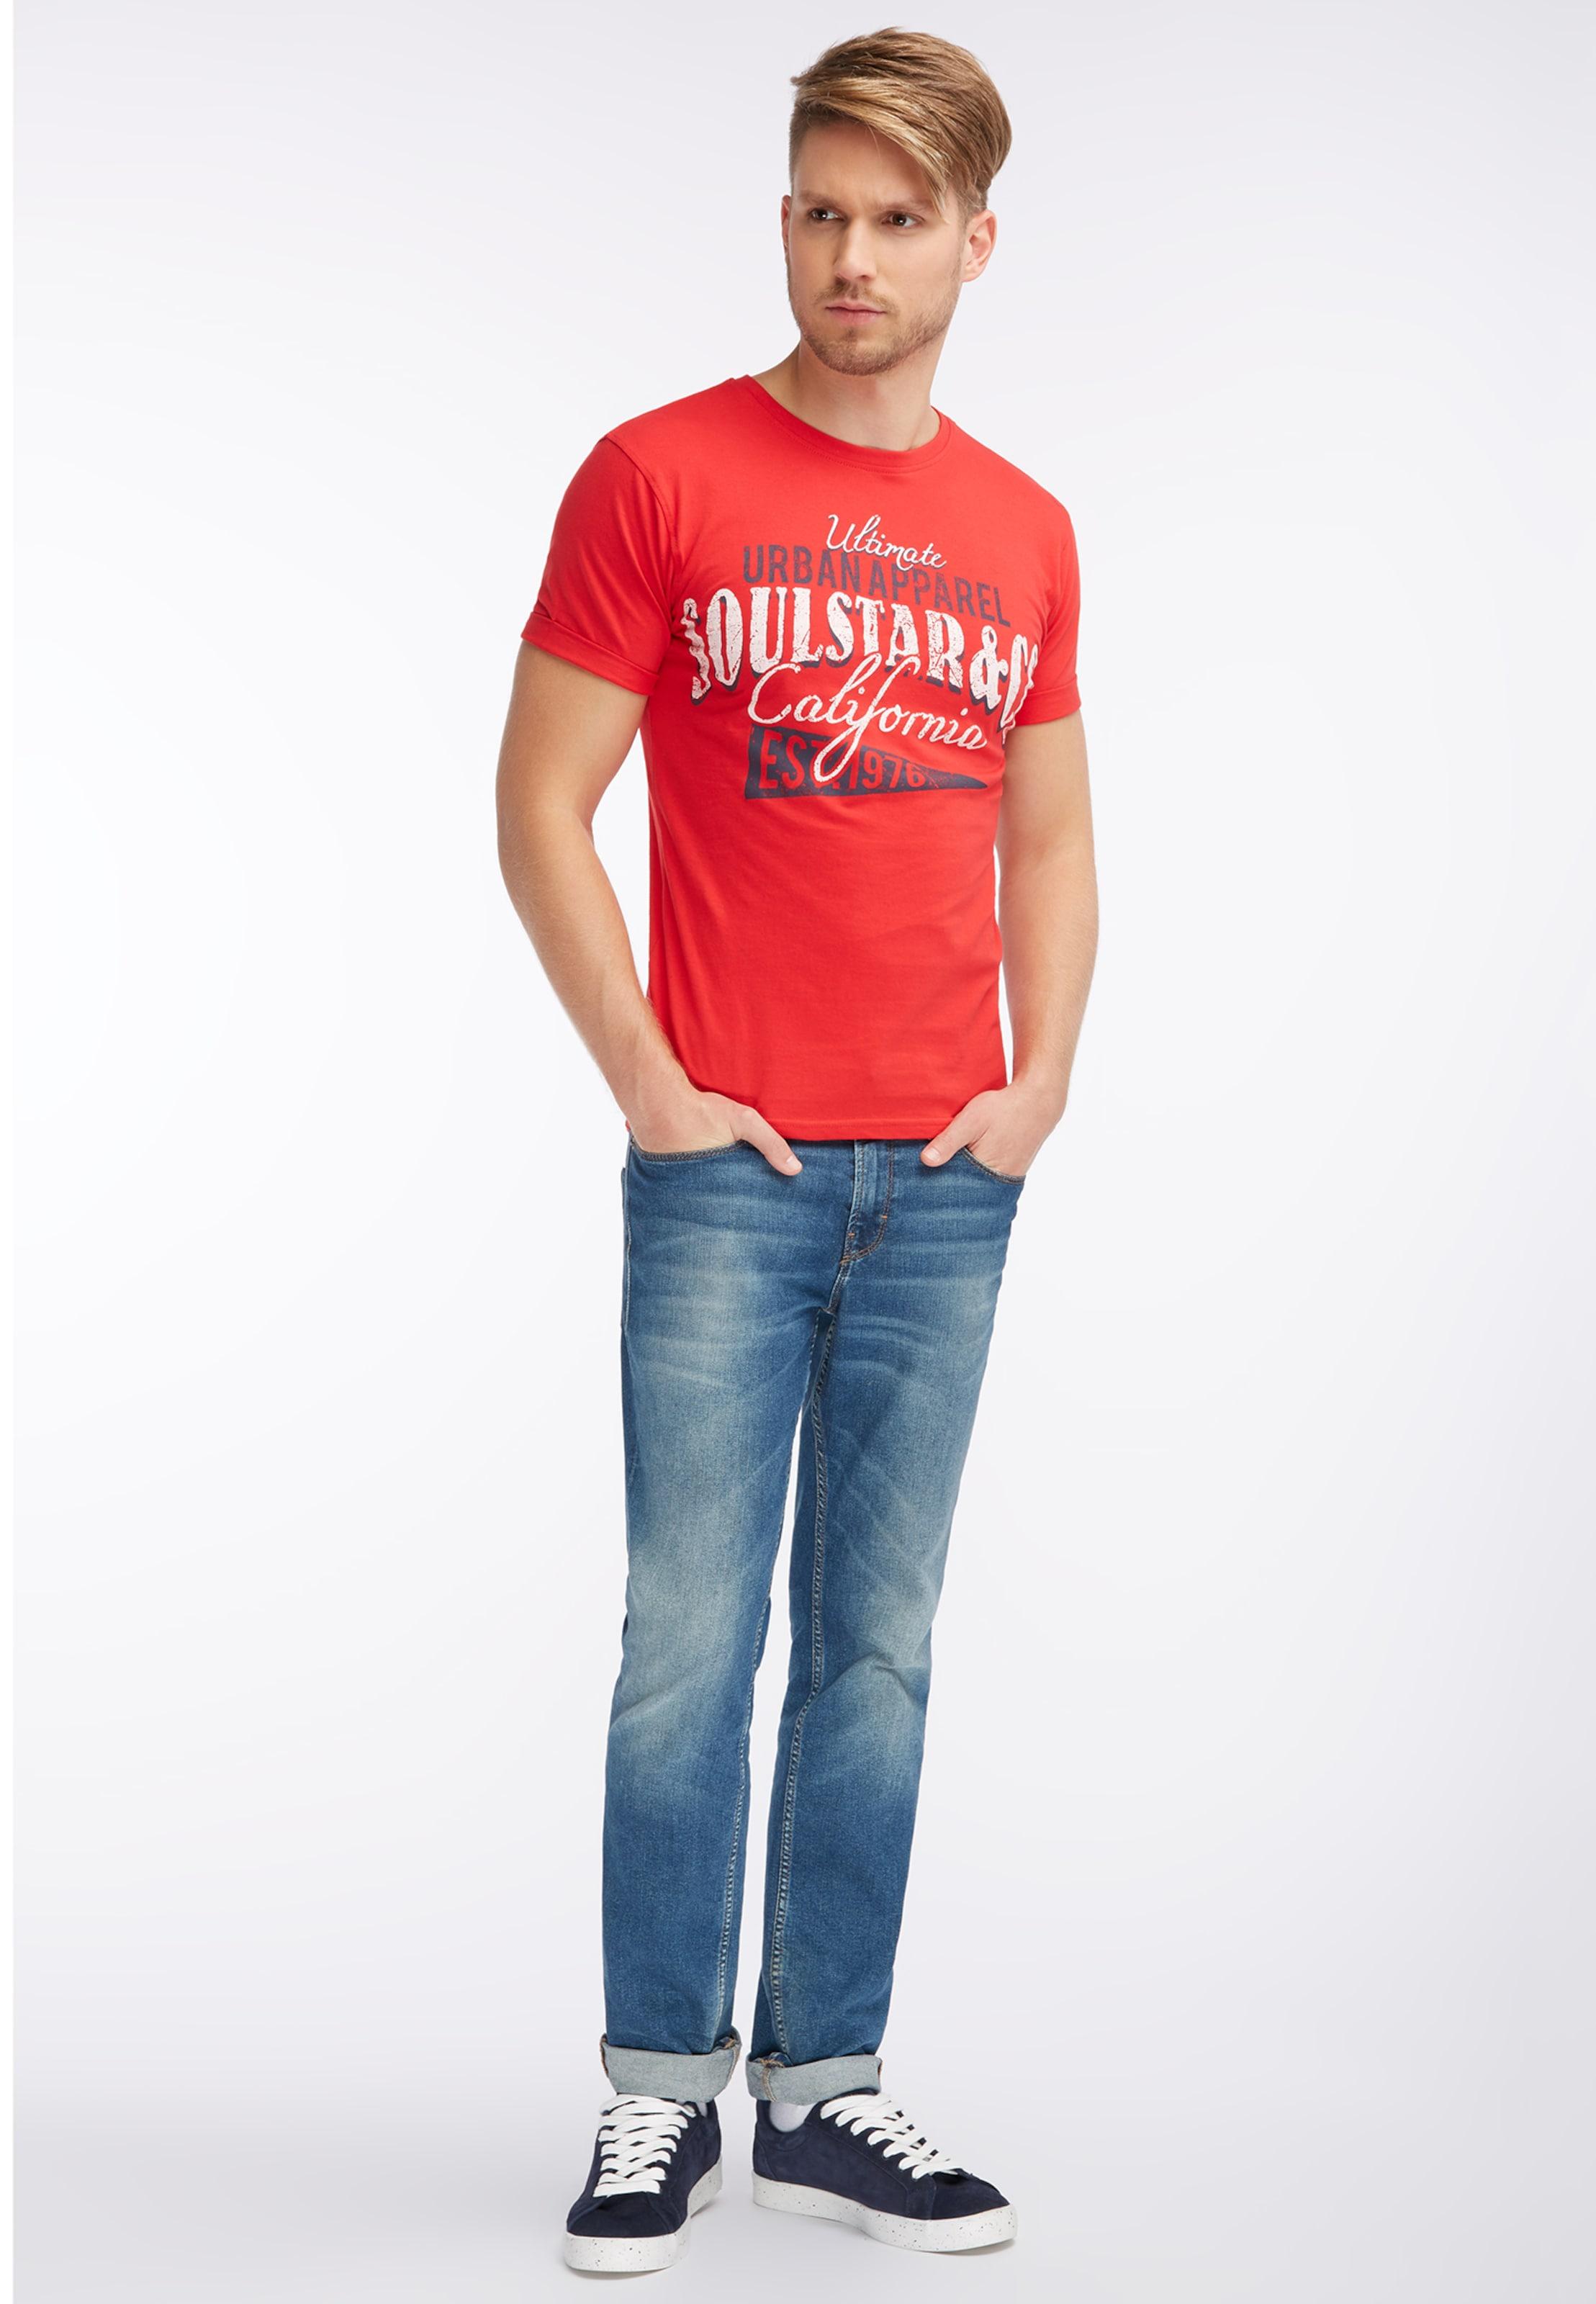 T shirt En Blanc RougeNoir Soulstar dWQBoreCx